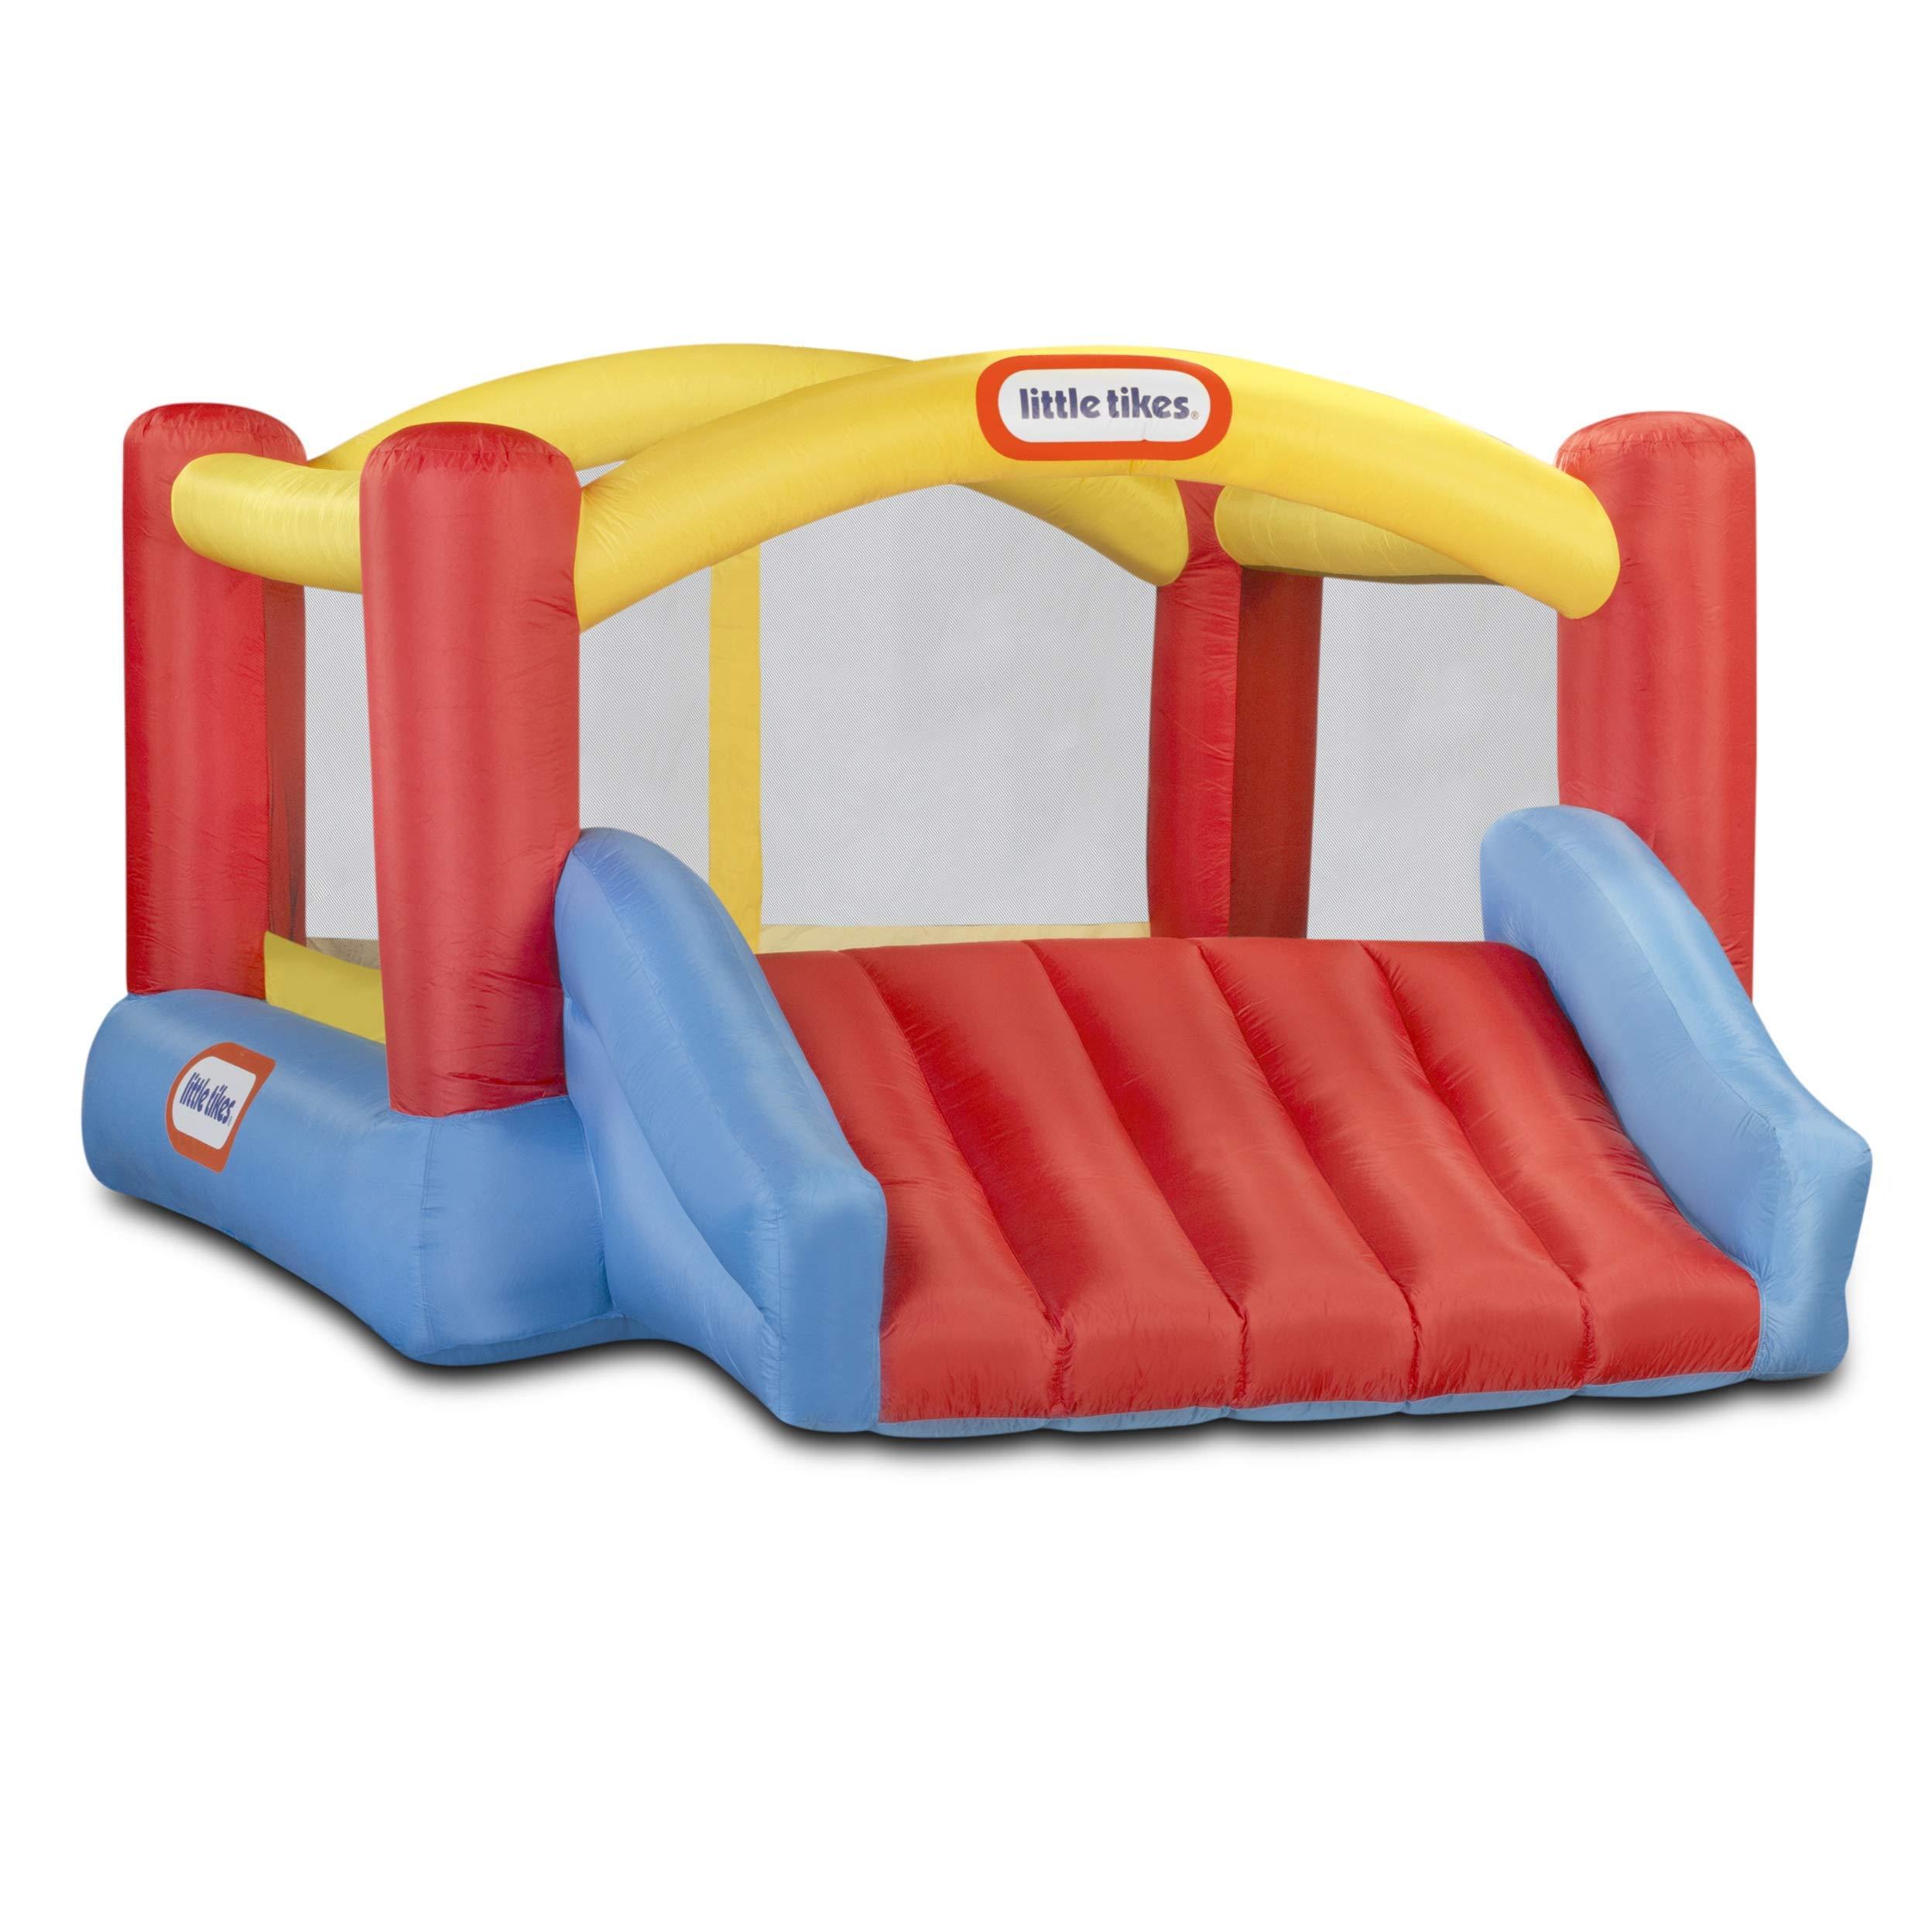 Little Tikes Inflatable Jump 'n Slide Bounce House w/heavy duty blower (Renewed)